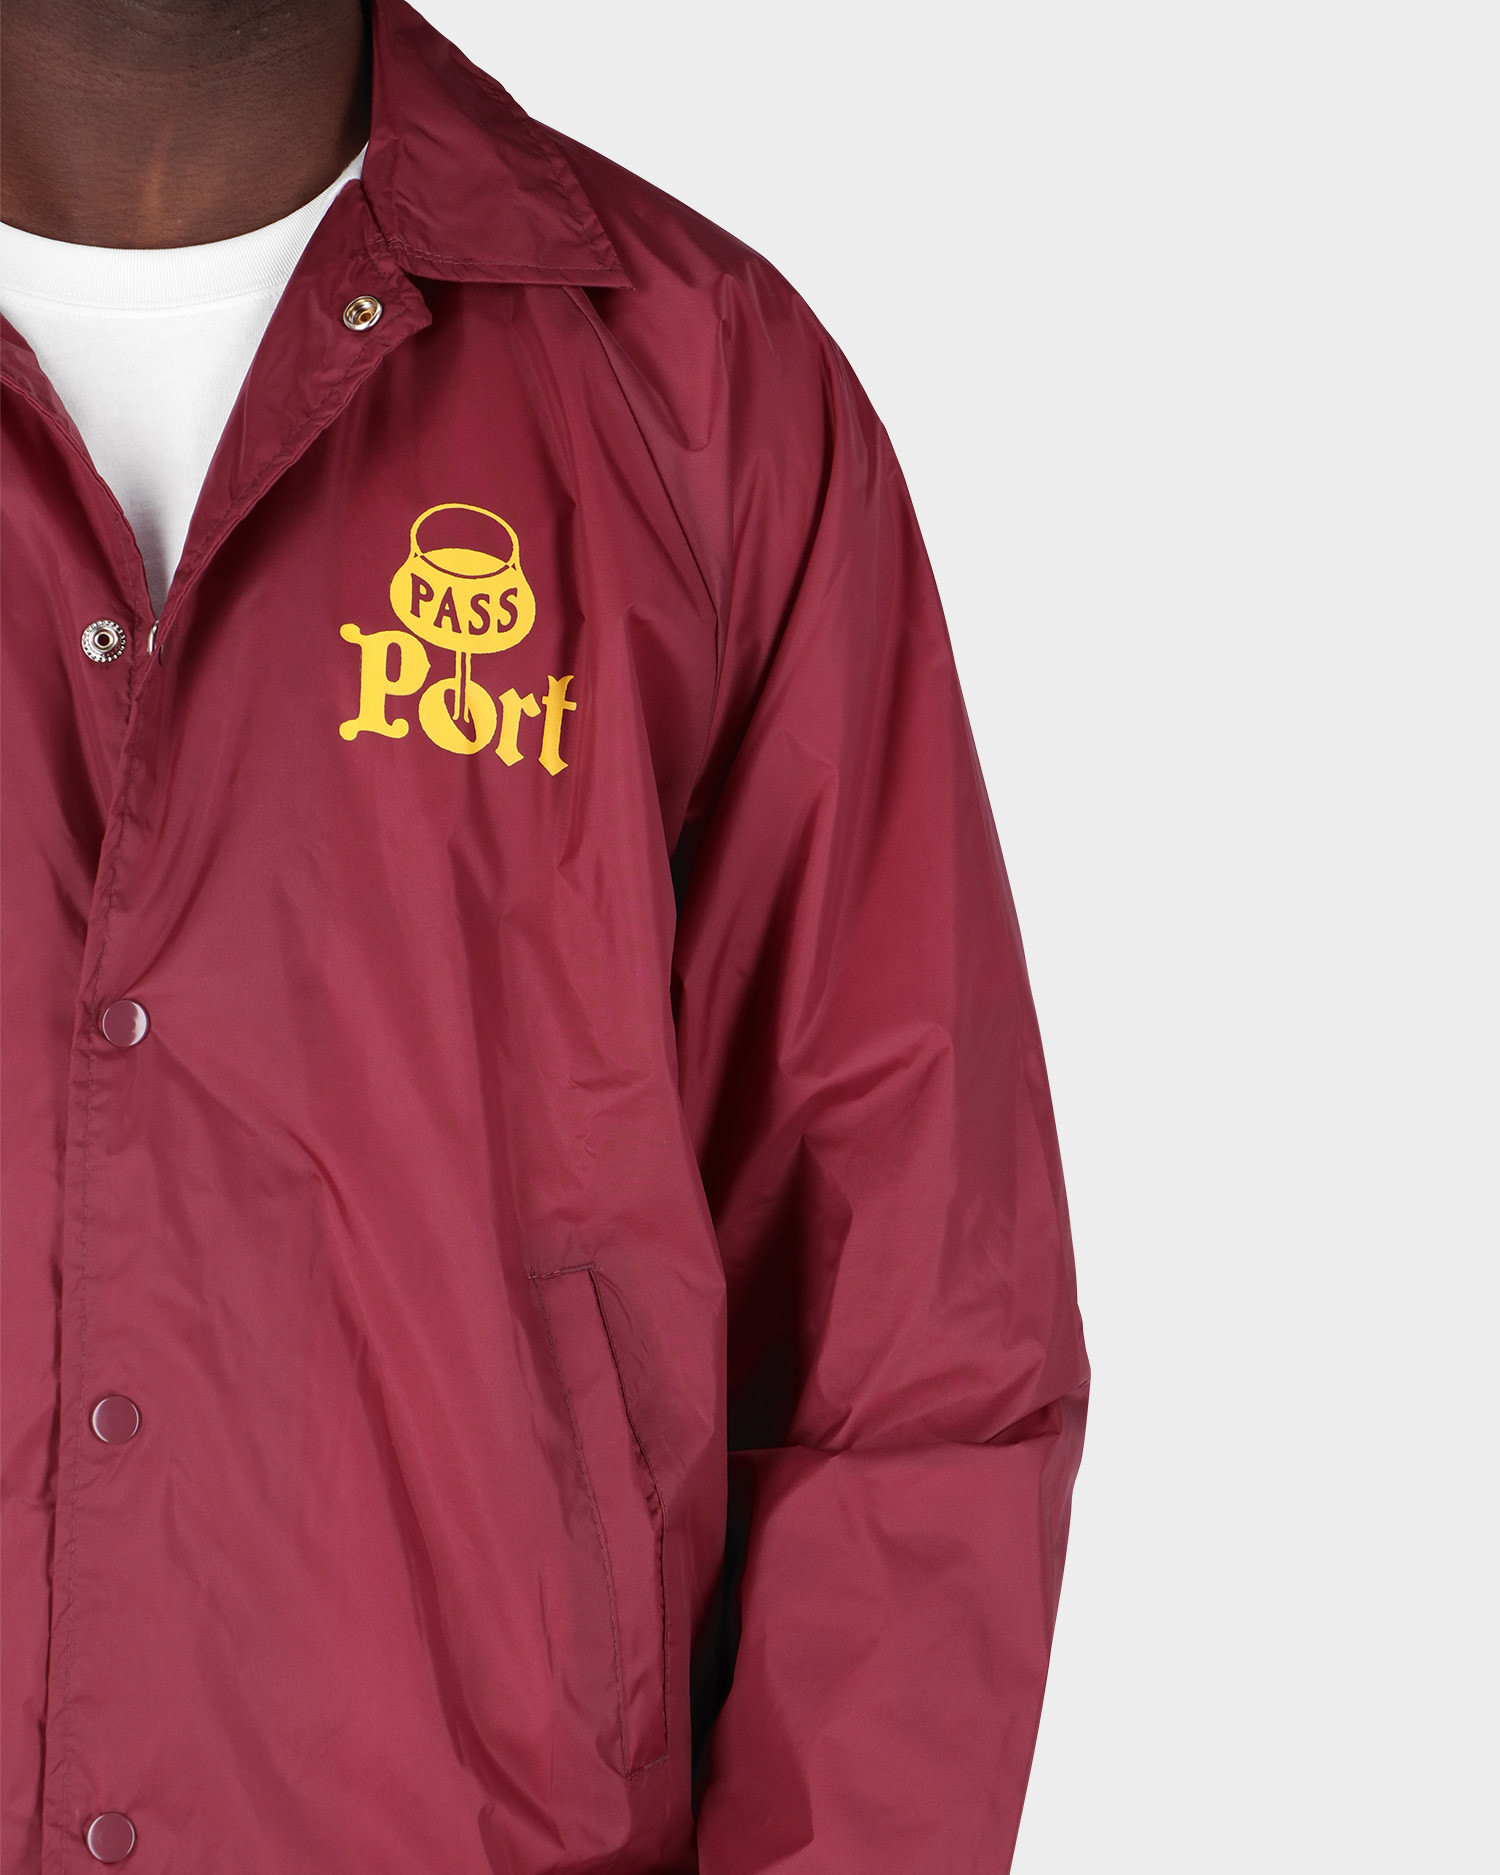 Passport Port Coach Jacket Maroon